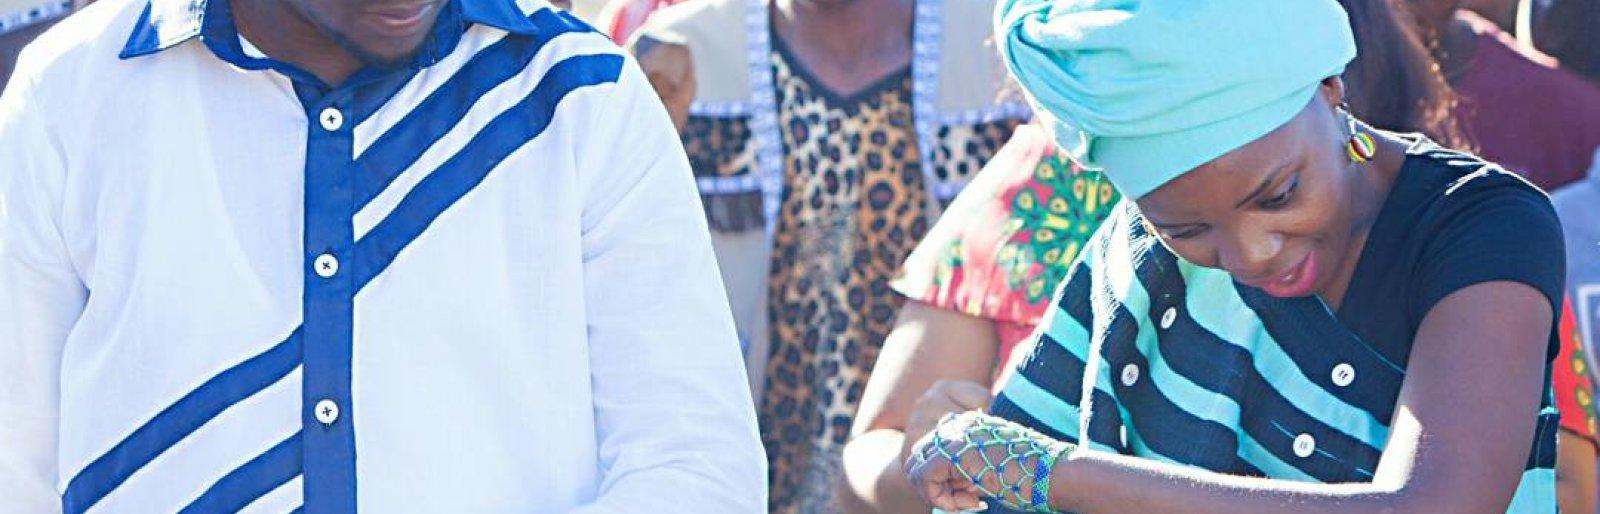 Thandeka Mzolo-Hlubi